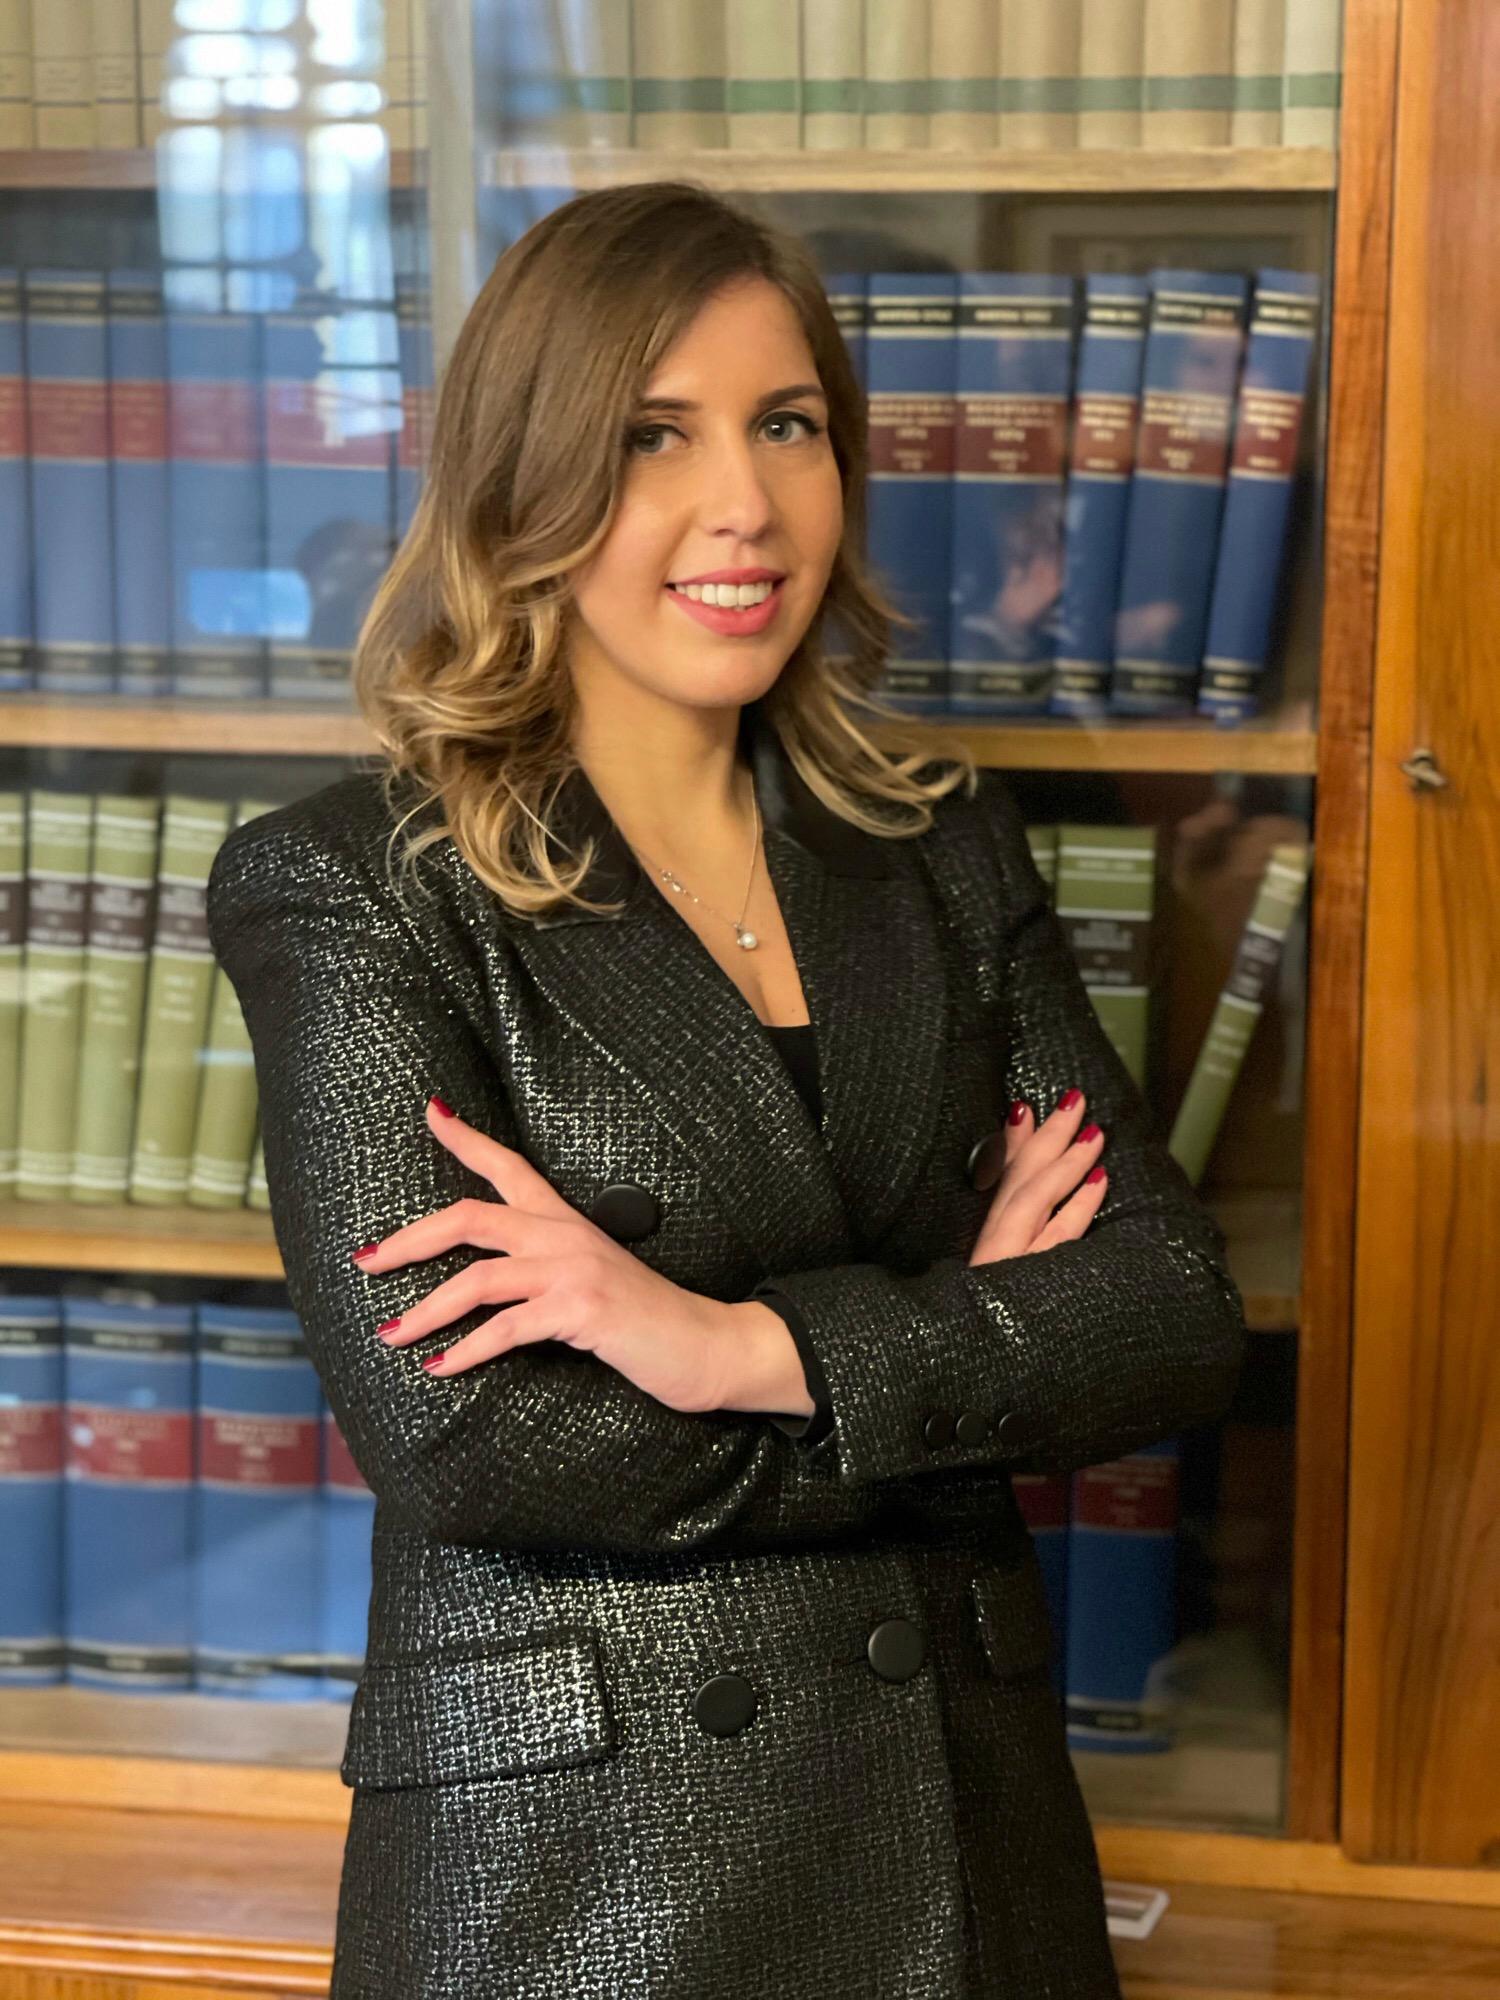 https://www.cdbavvocati.com/wp-content/uploads/2021/01/Elisabetta-Riccardo.jpg